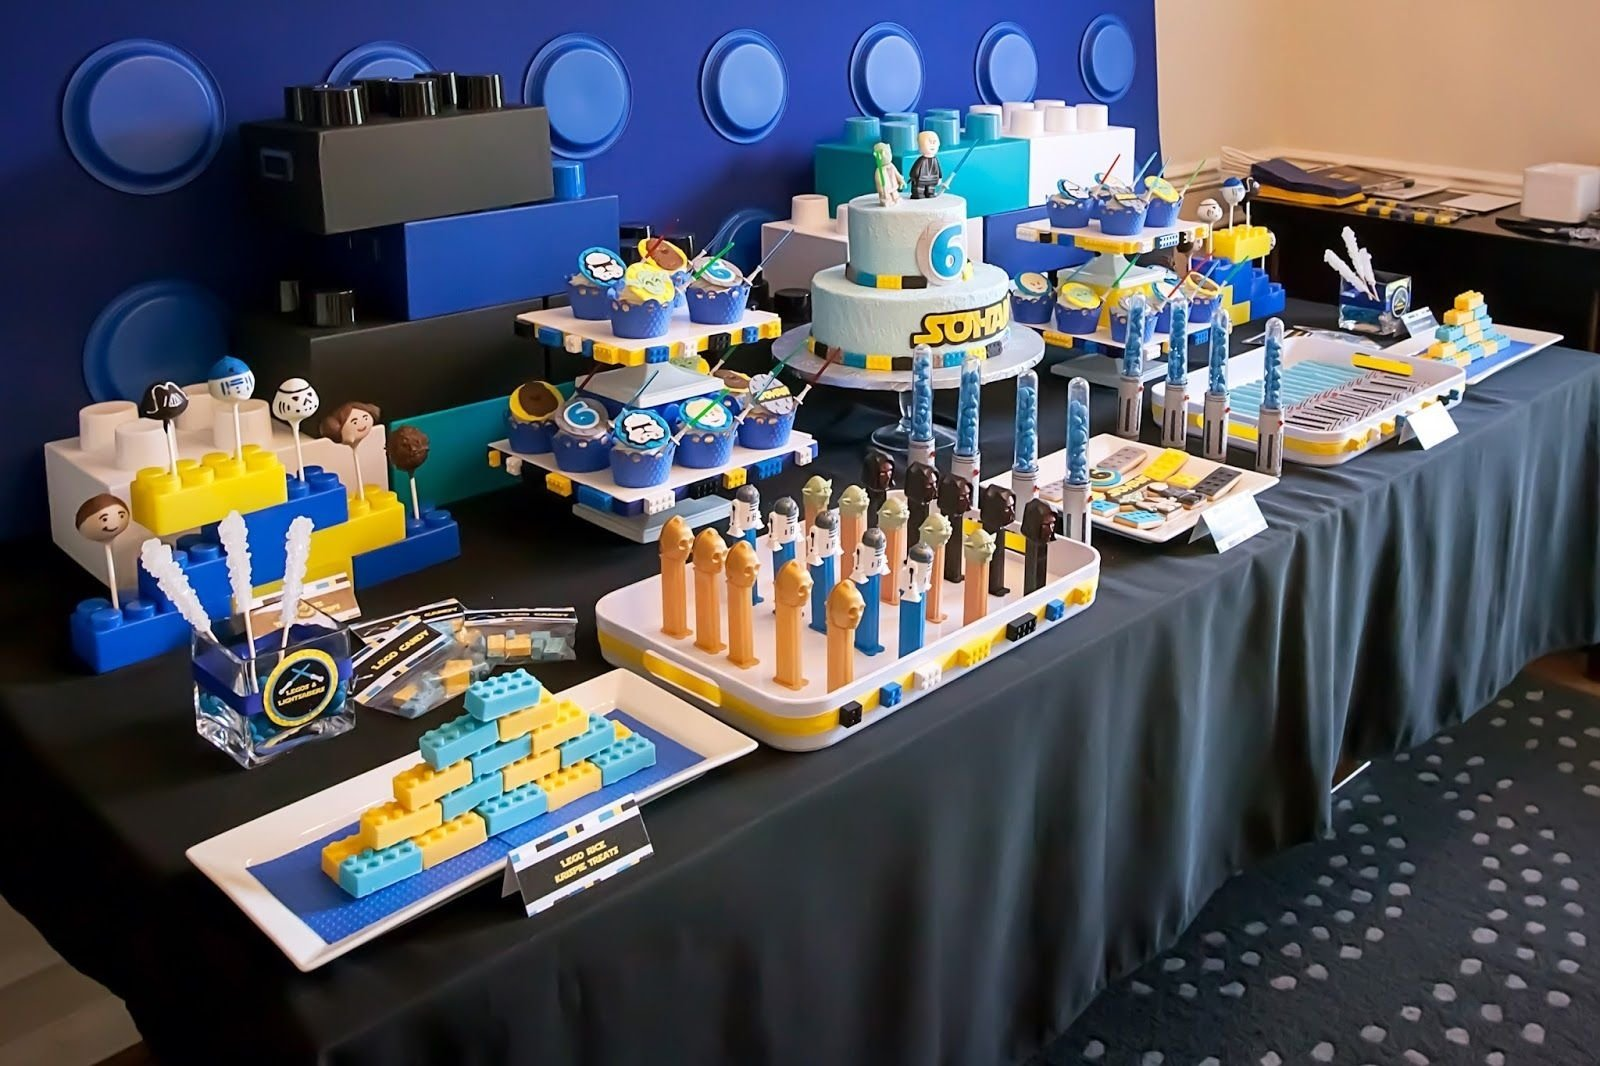 10 Fantastic Lego Star Wars Birthday Party Ideas pincobey dietrich on birthday parties pinterest lego star 2021